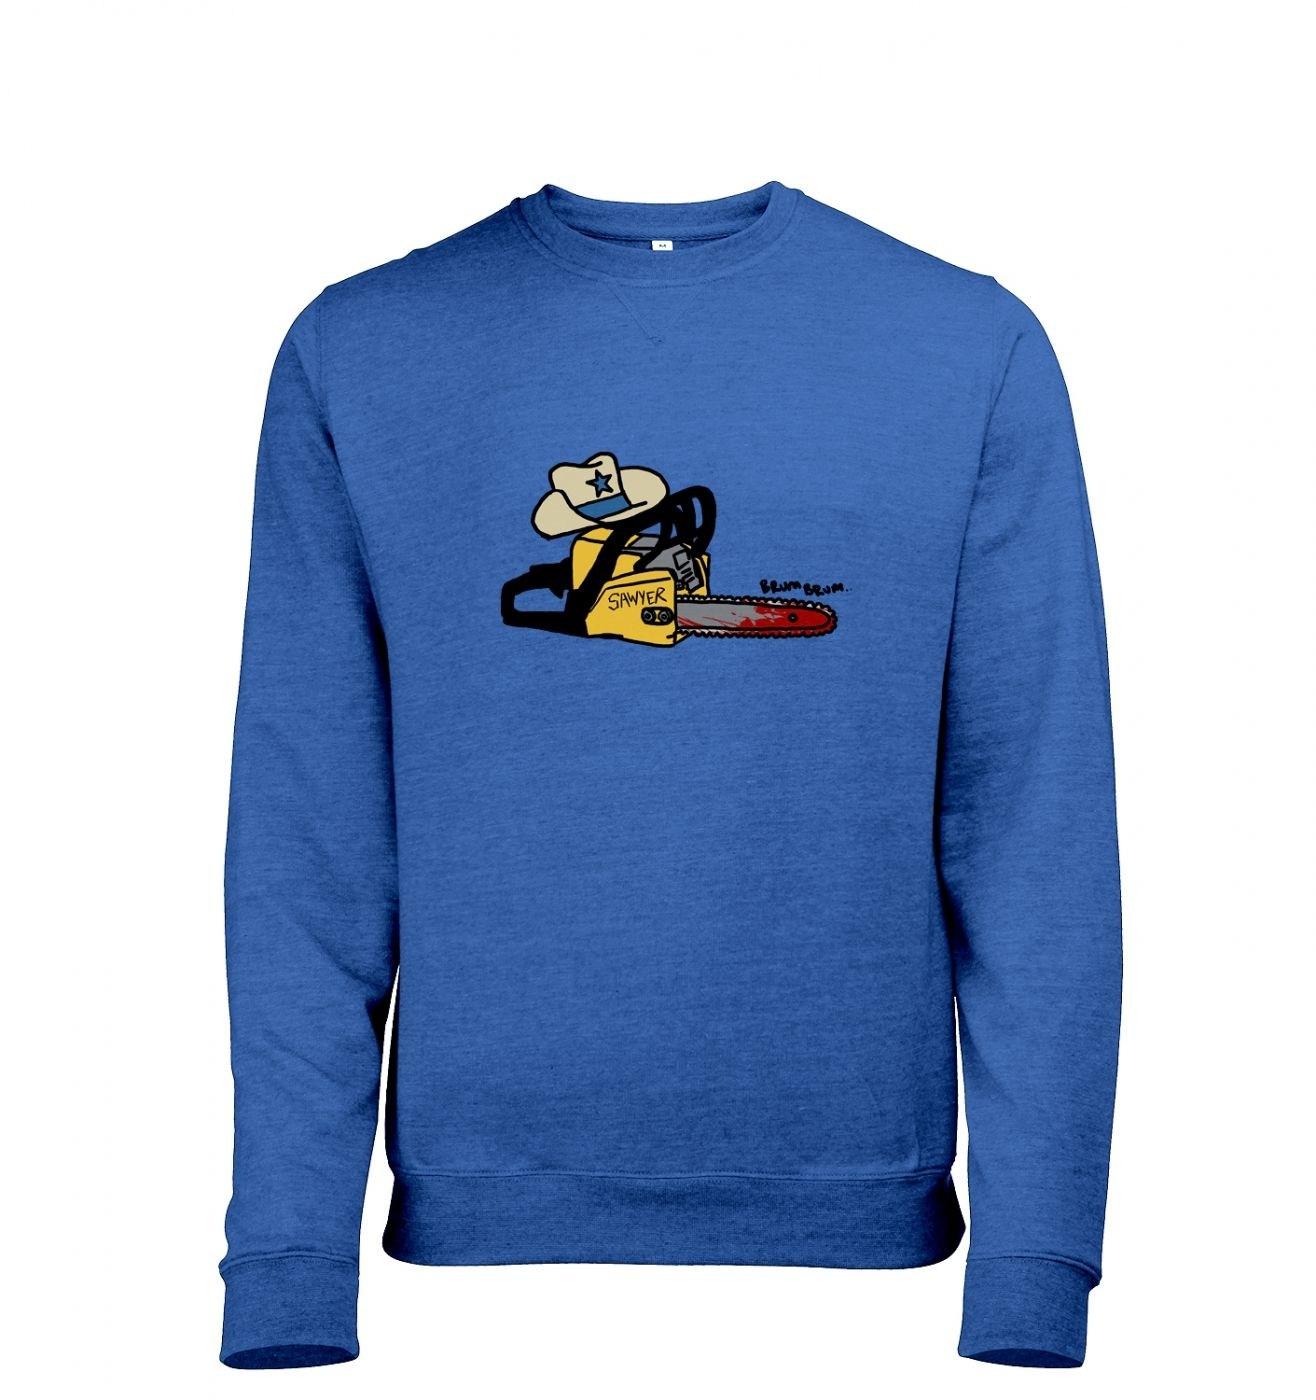 Texas Chainsawyer adults' heather crewneck sweatshirt